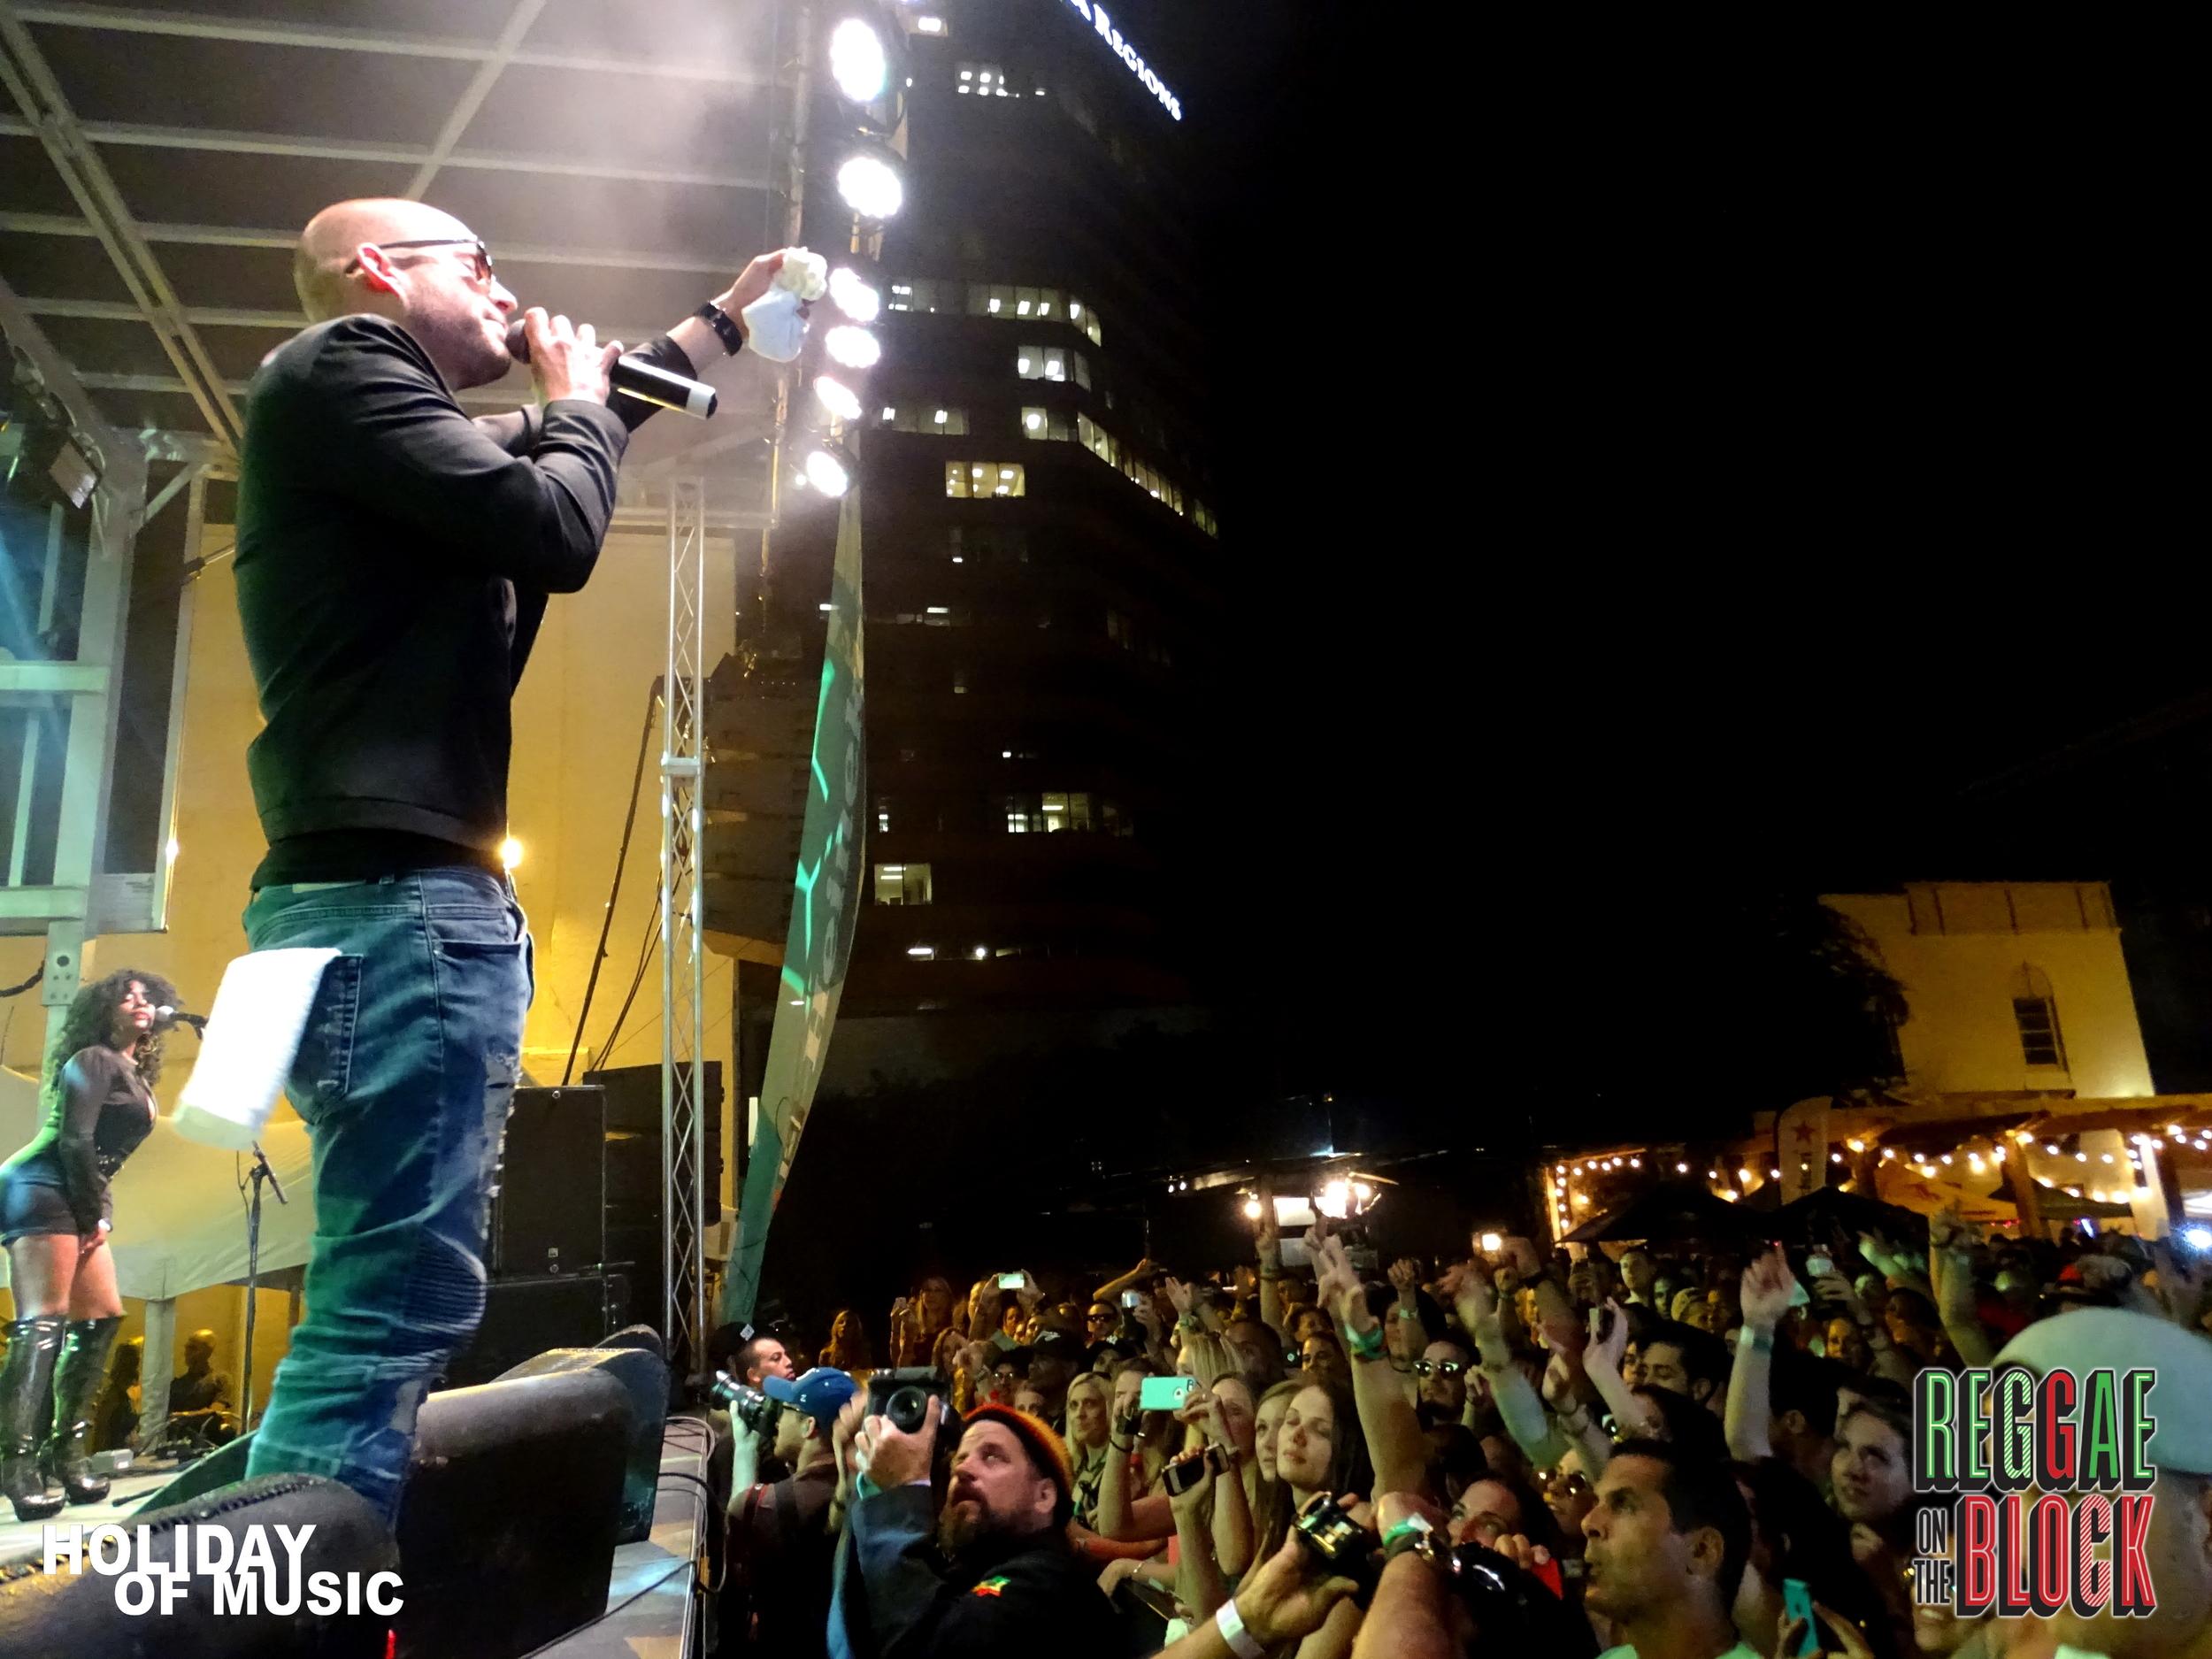 Collie Buddz - Reggae on the Block